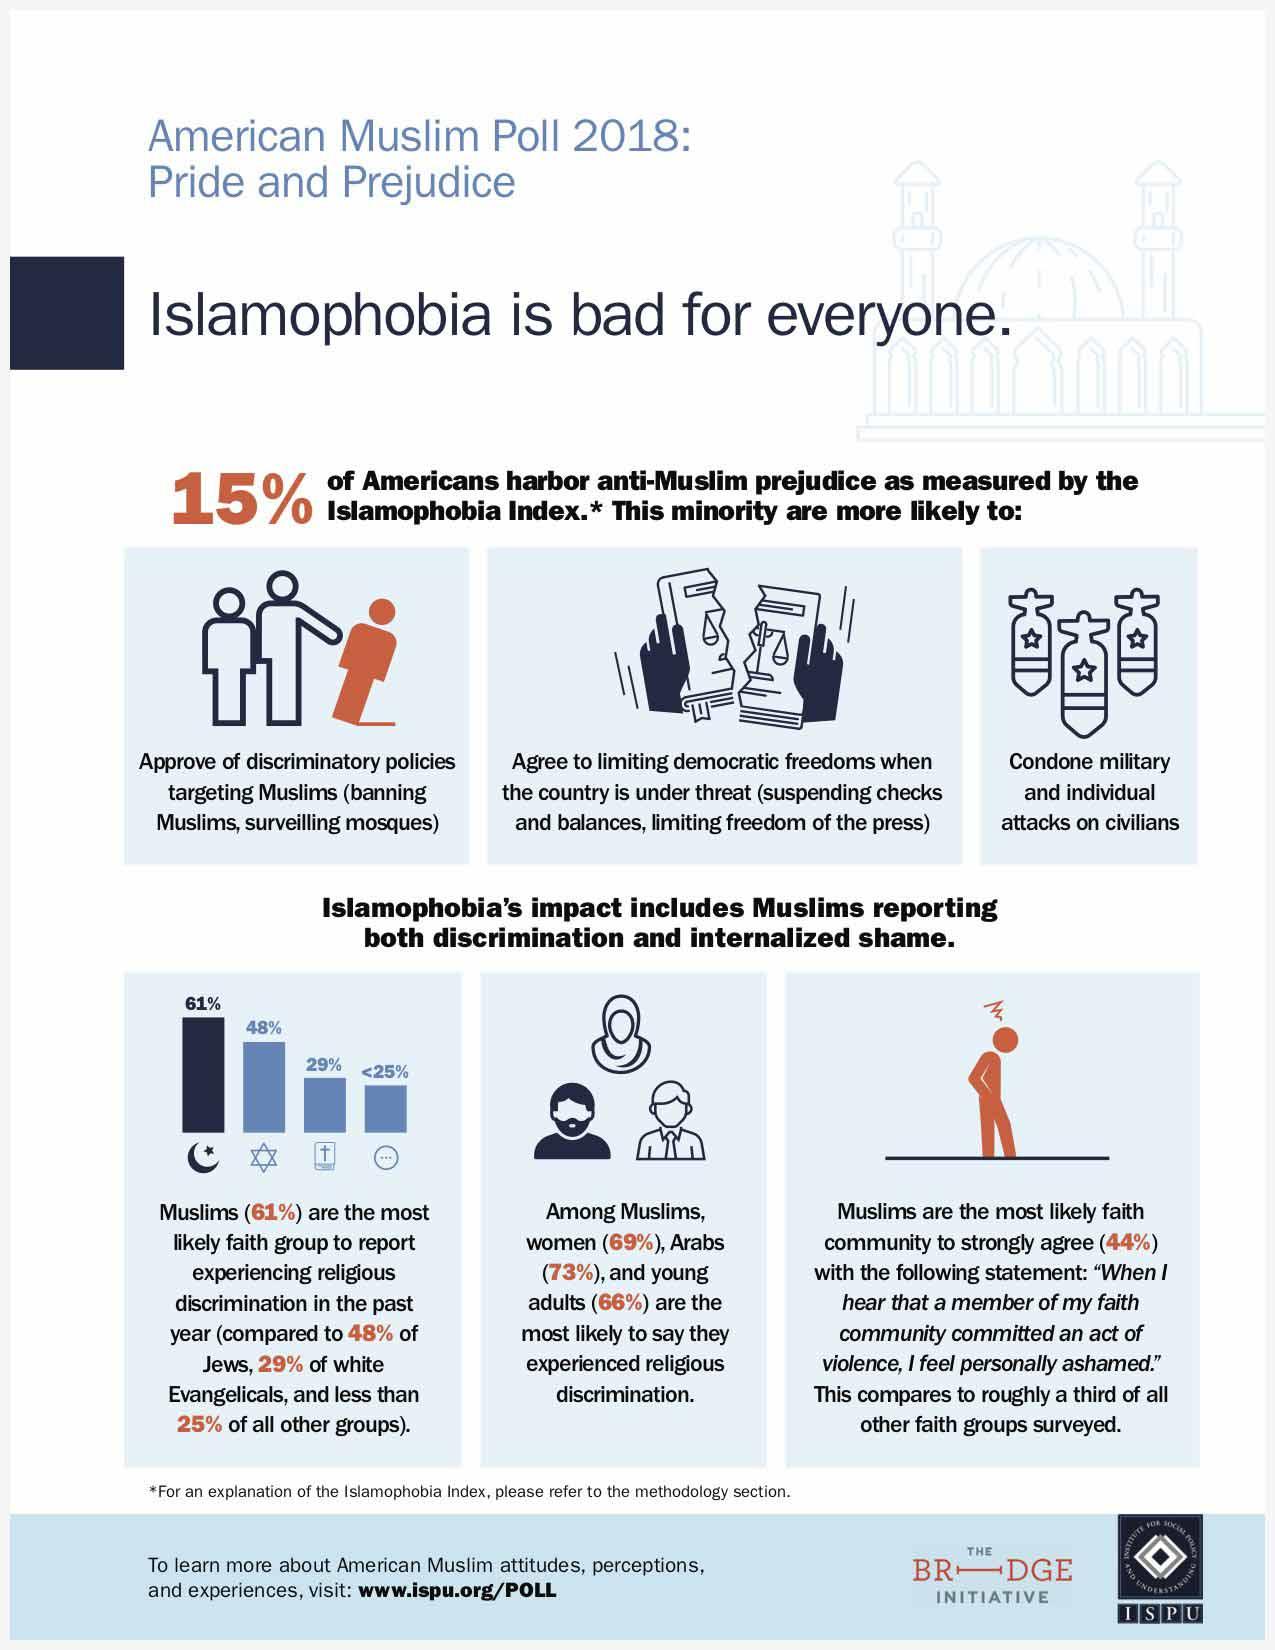 Islamophobia is bad for everyone infographic